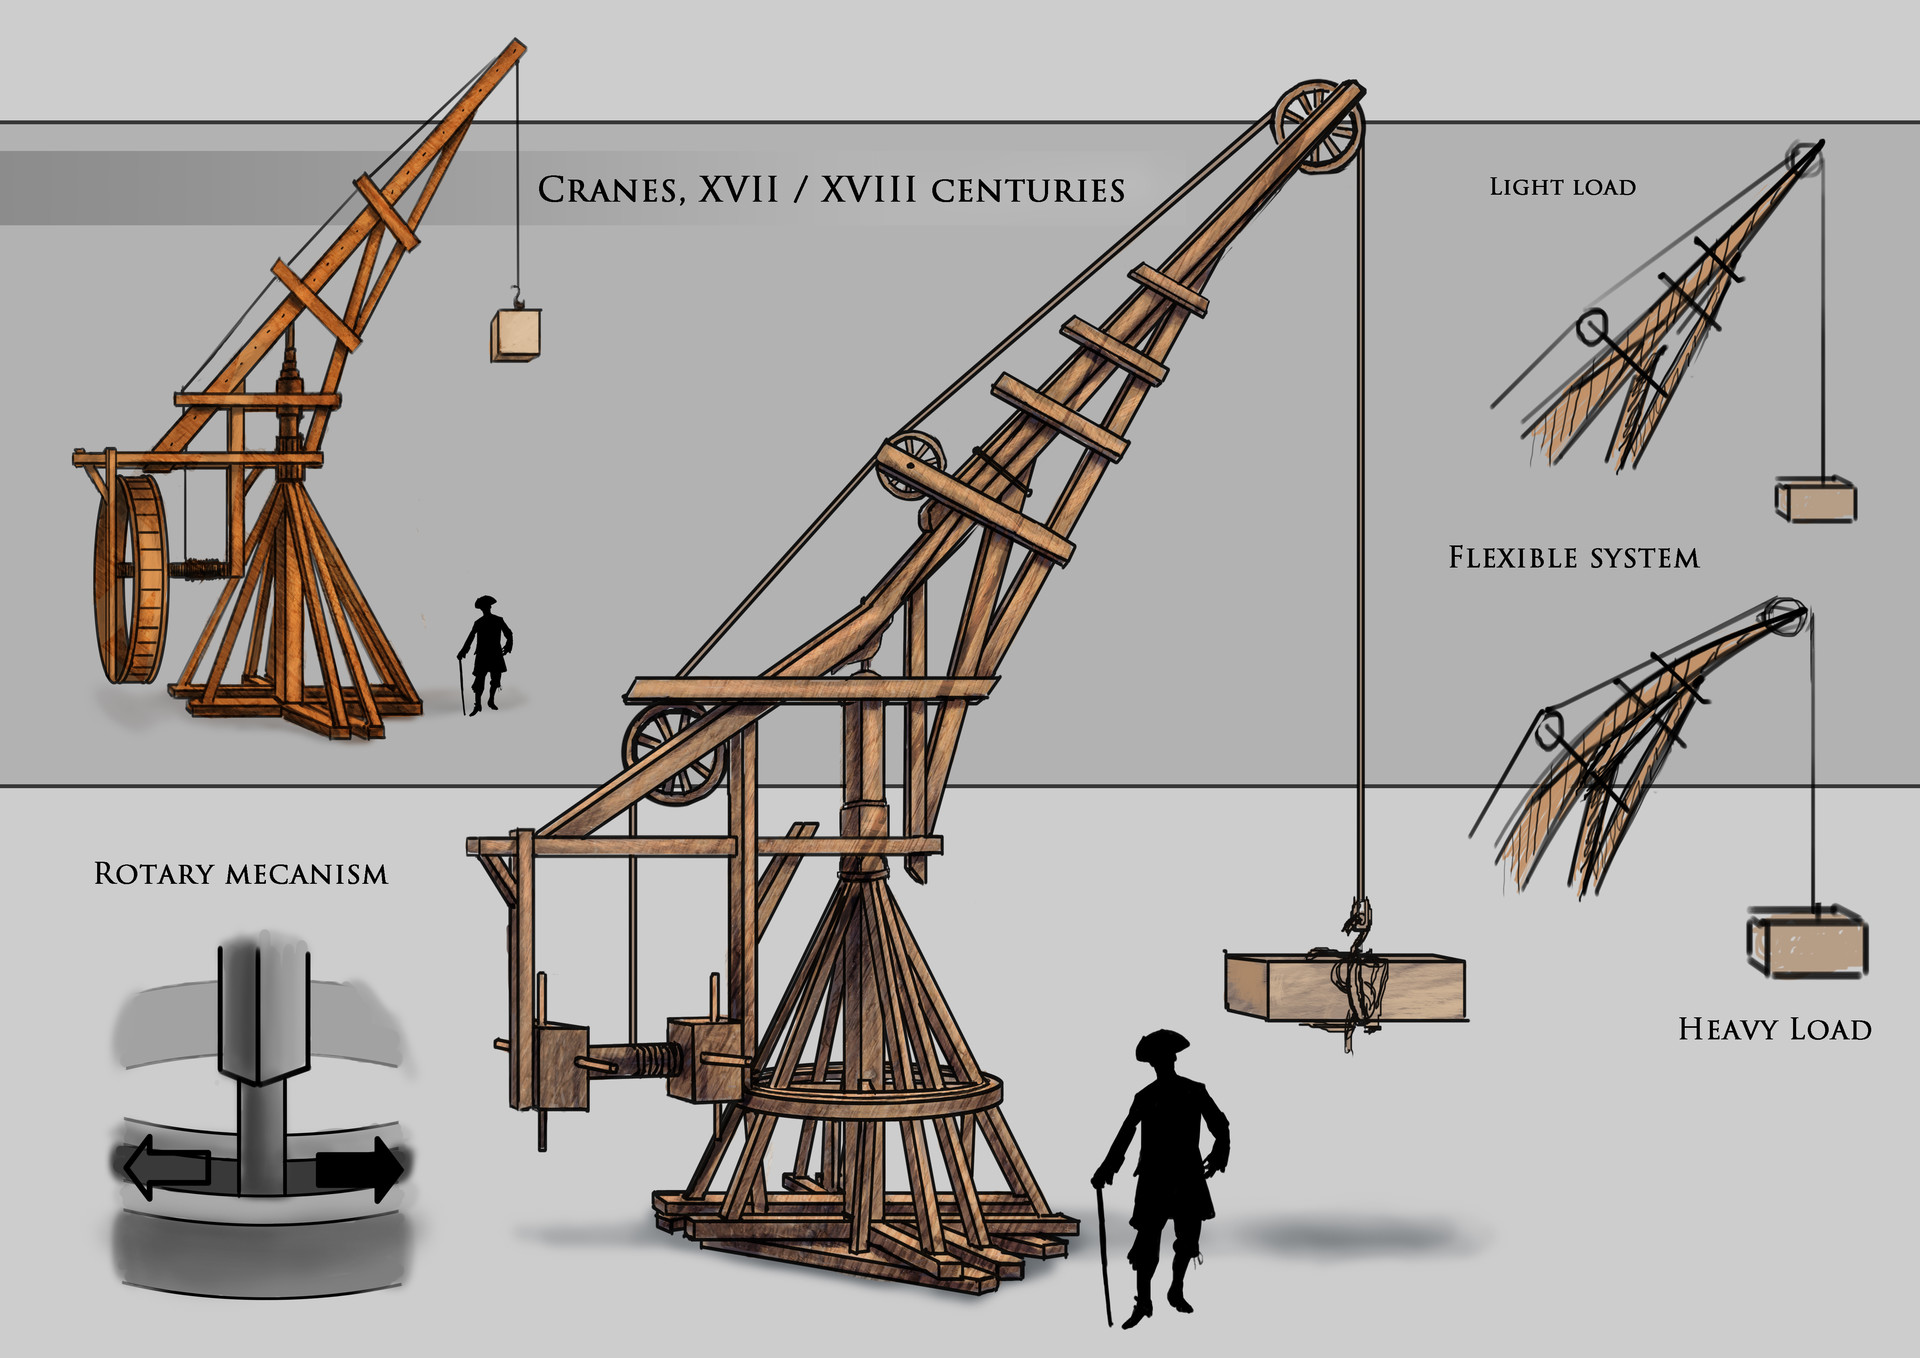 Quentin castel english conceptgrue nyx2